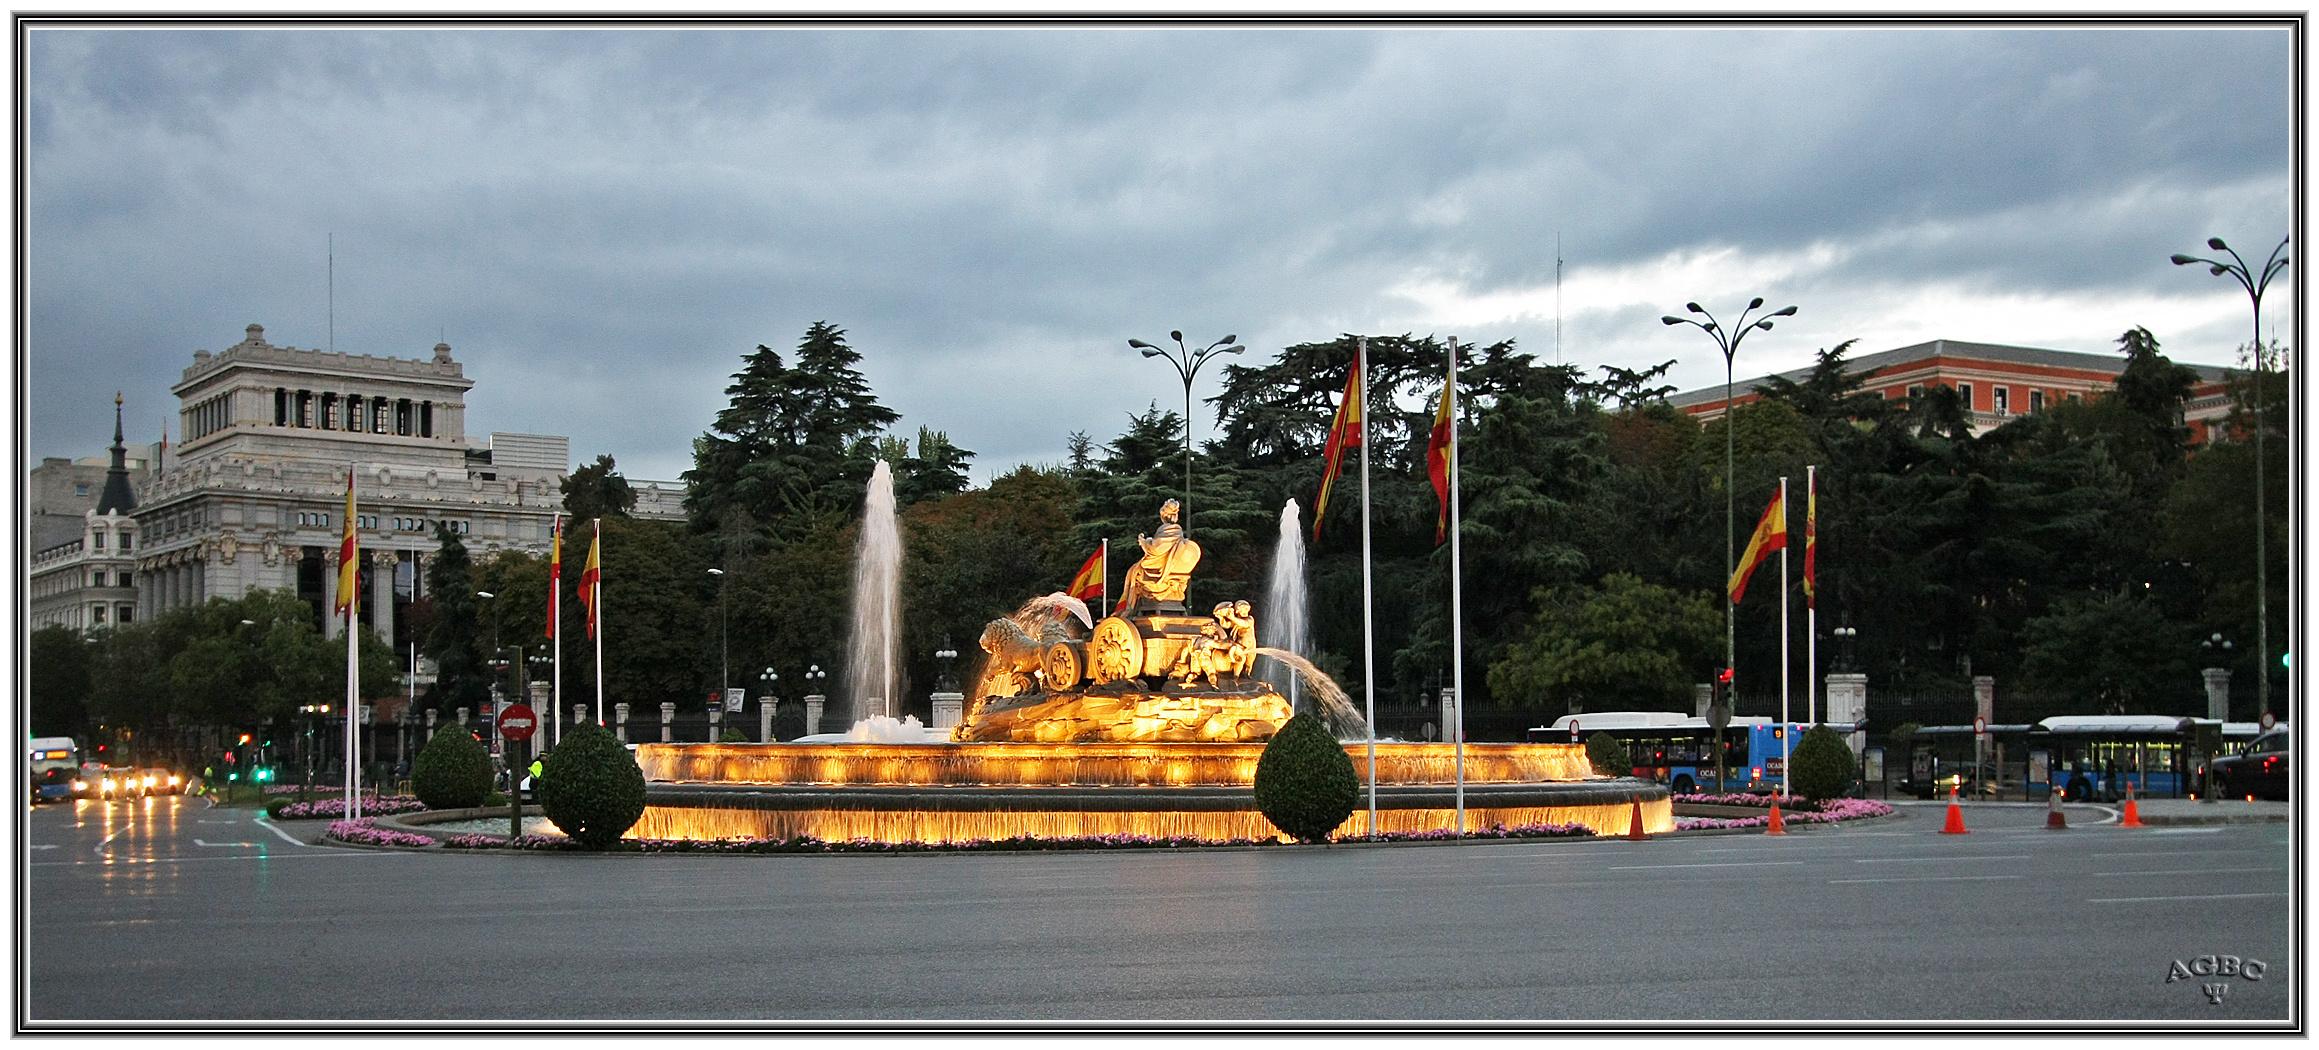 Fuente de Cibeles, Madrid. GKM5-I